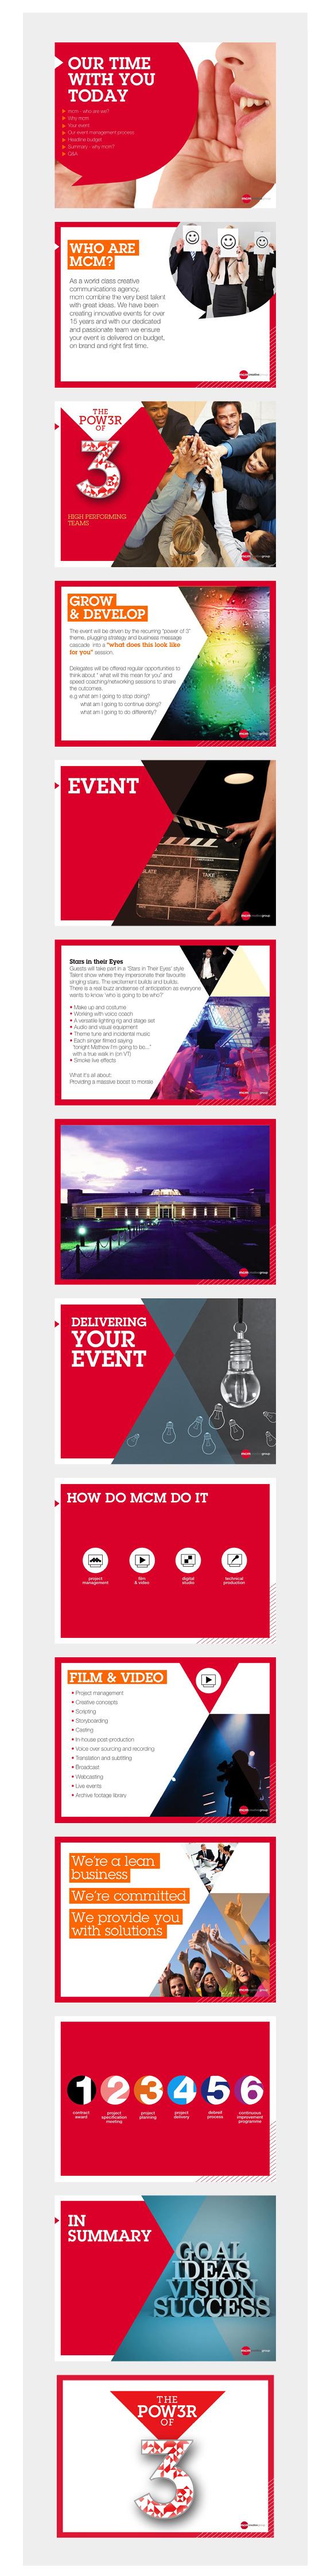 "hsbc presentation""dalya dahrouge, via behance. this powerpoint, Presentation templates"